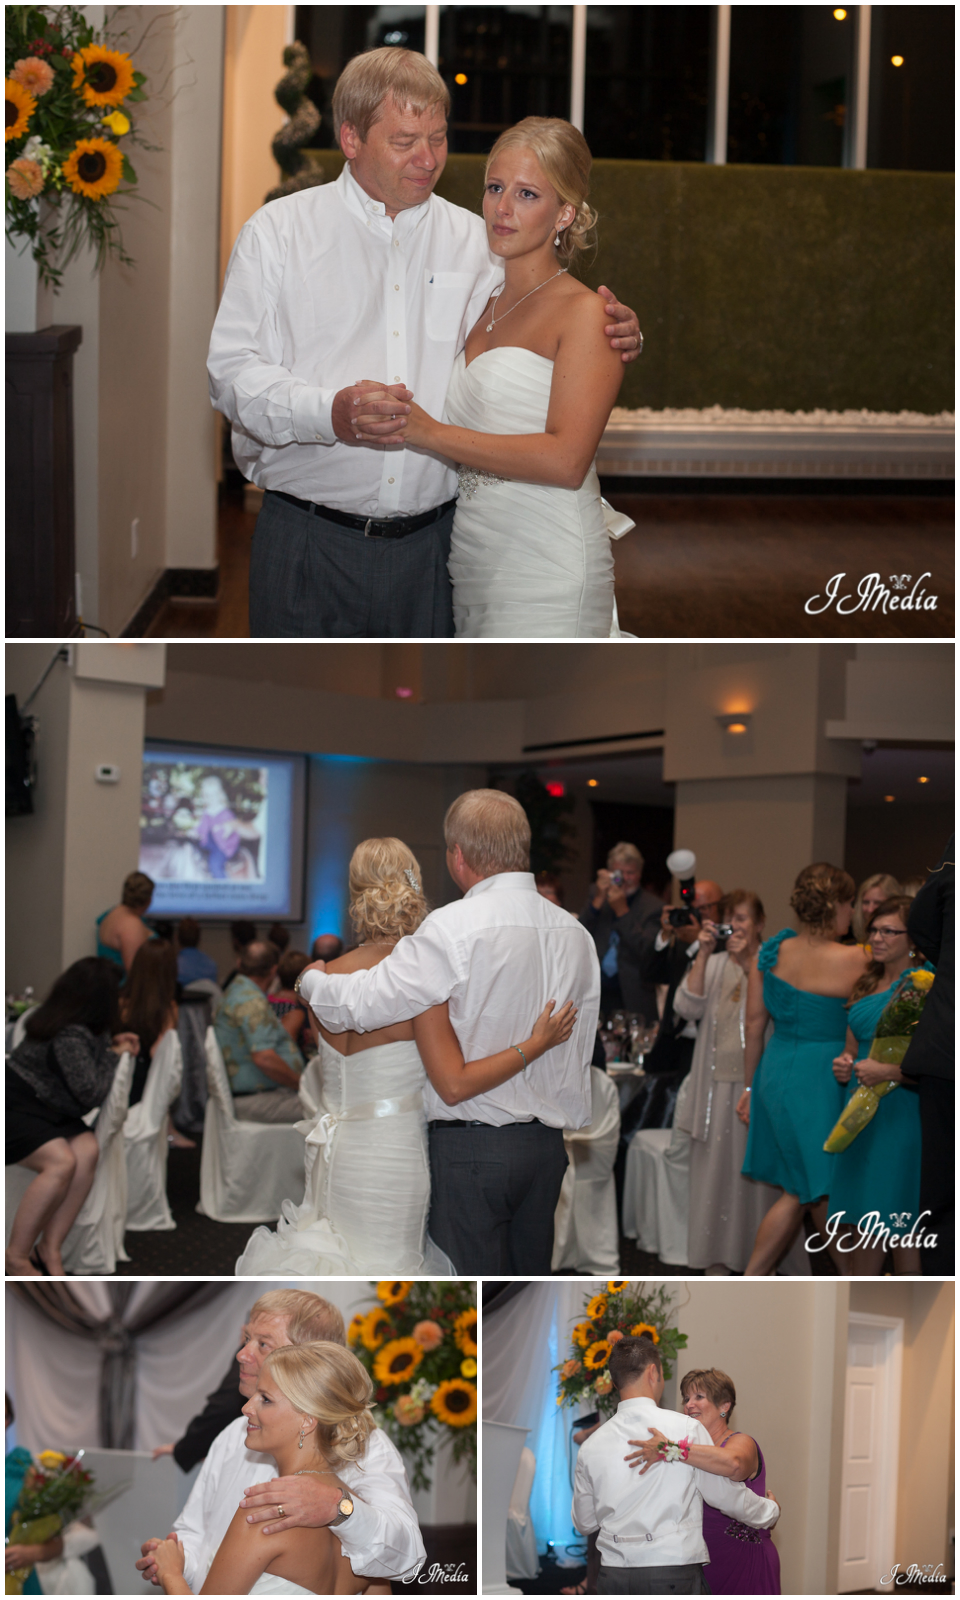 Atrium-Wedding-Photography-JJMedia-14